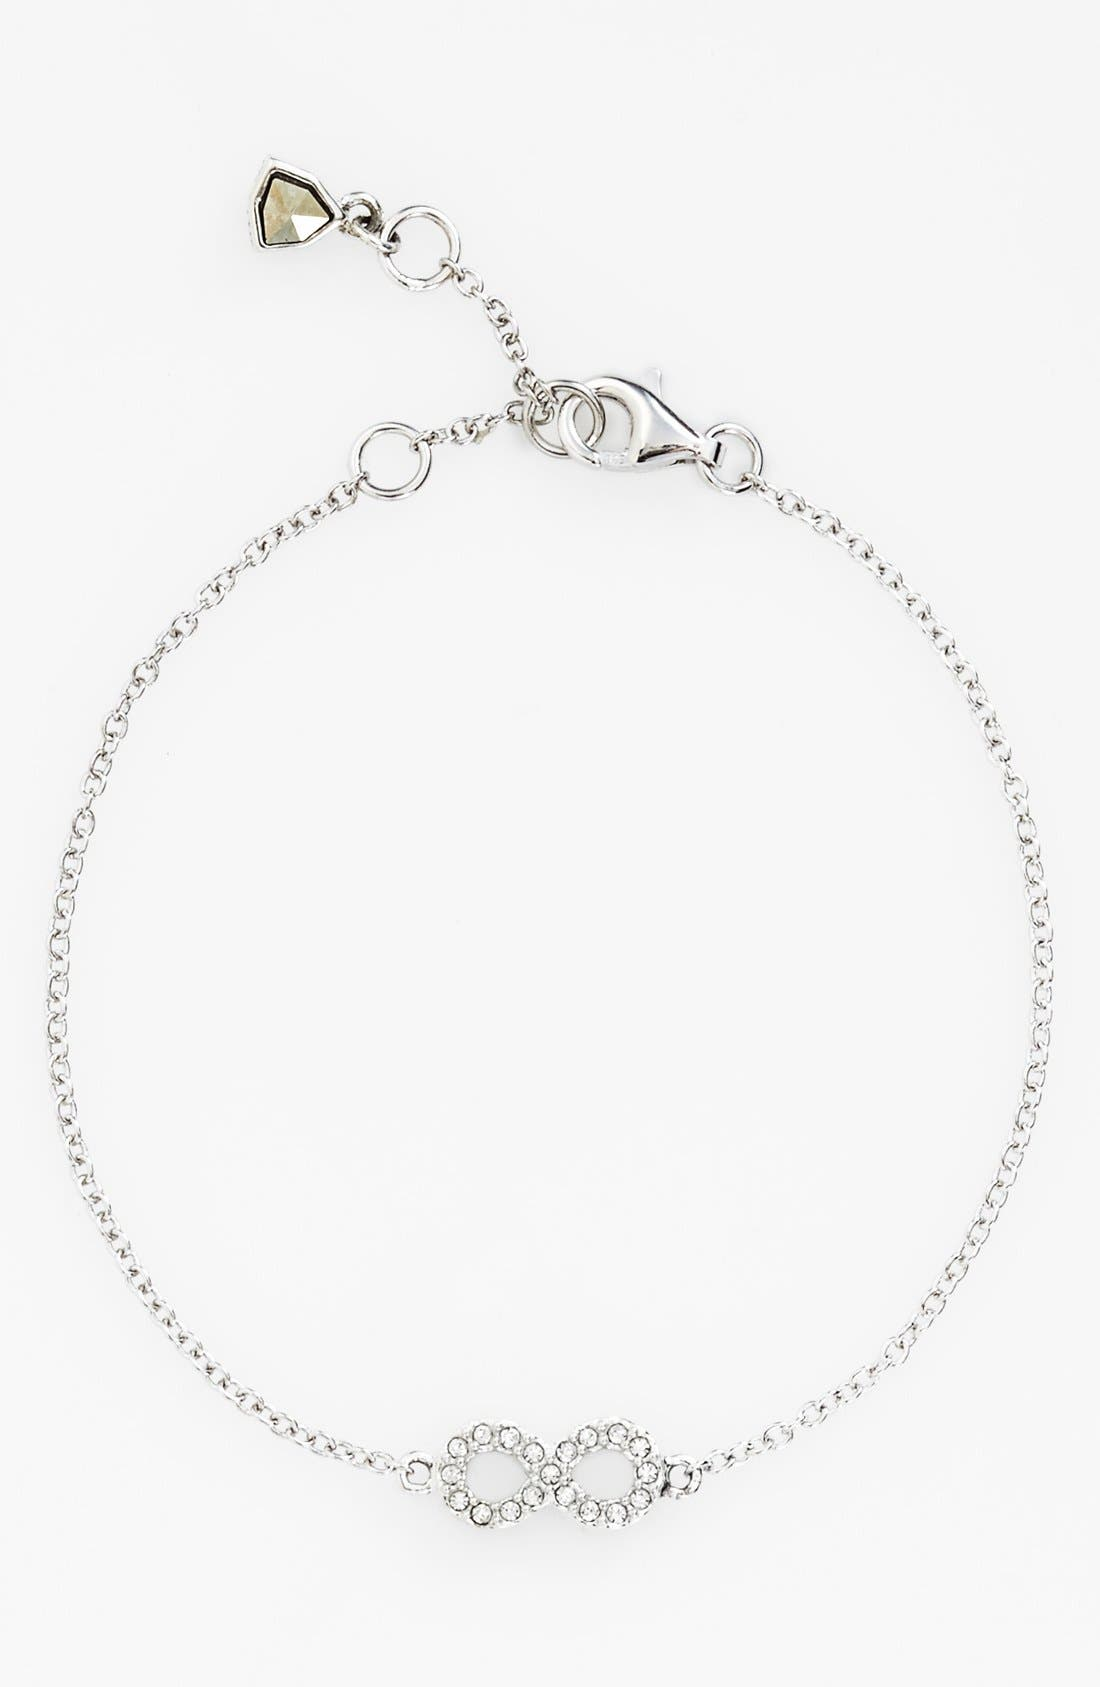 Main Image - Judith Jack 'Mini Motives' Infinity Symbol Station Bracelet